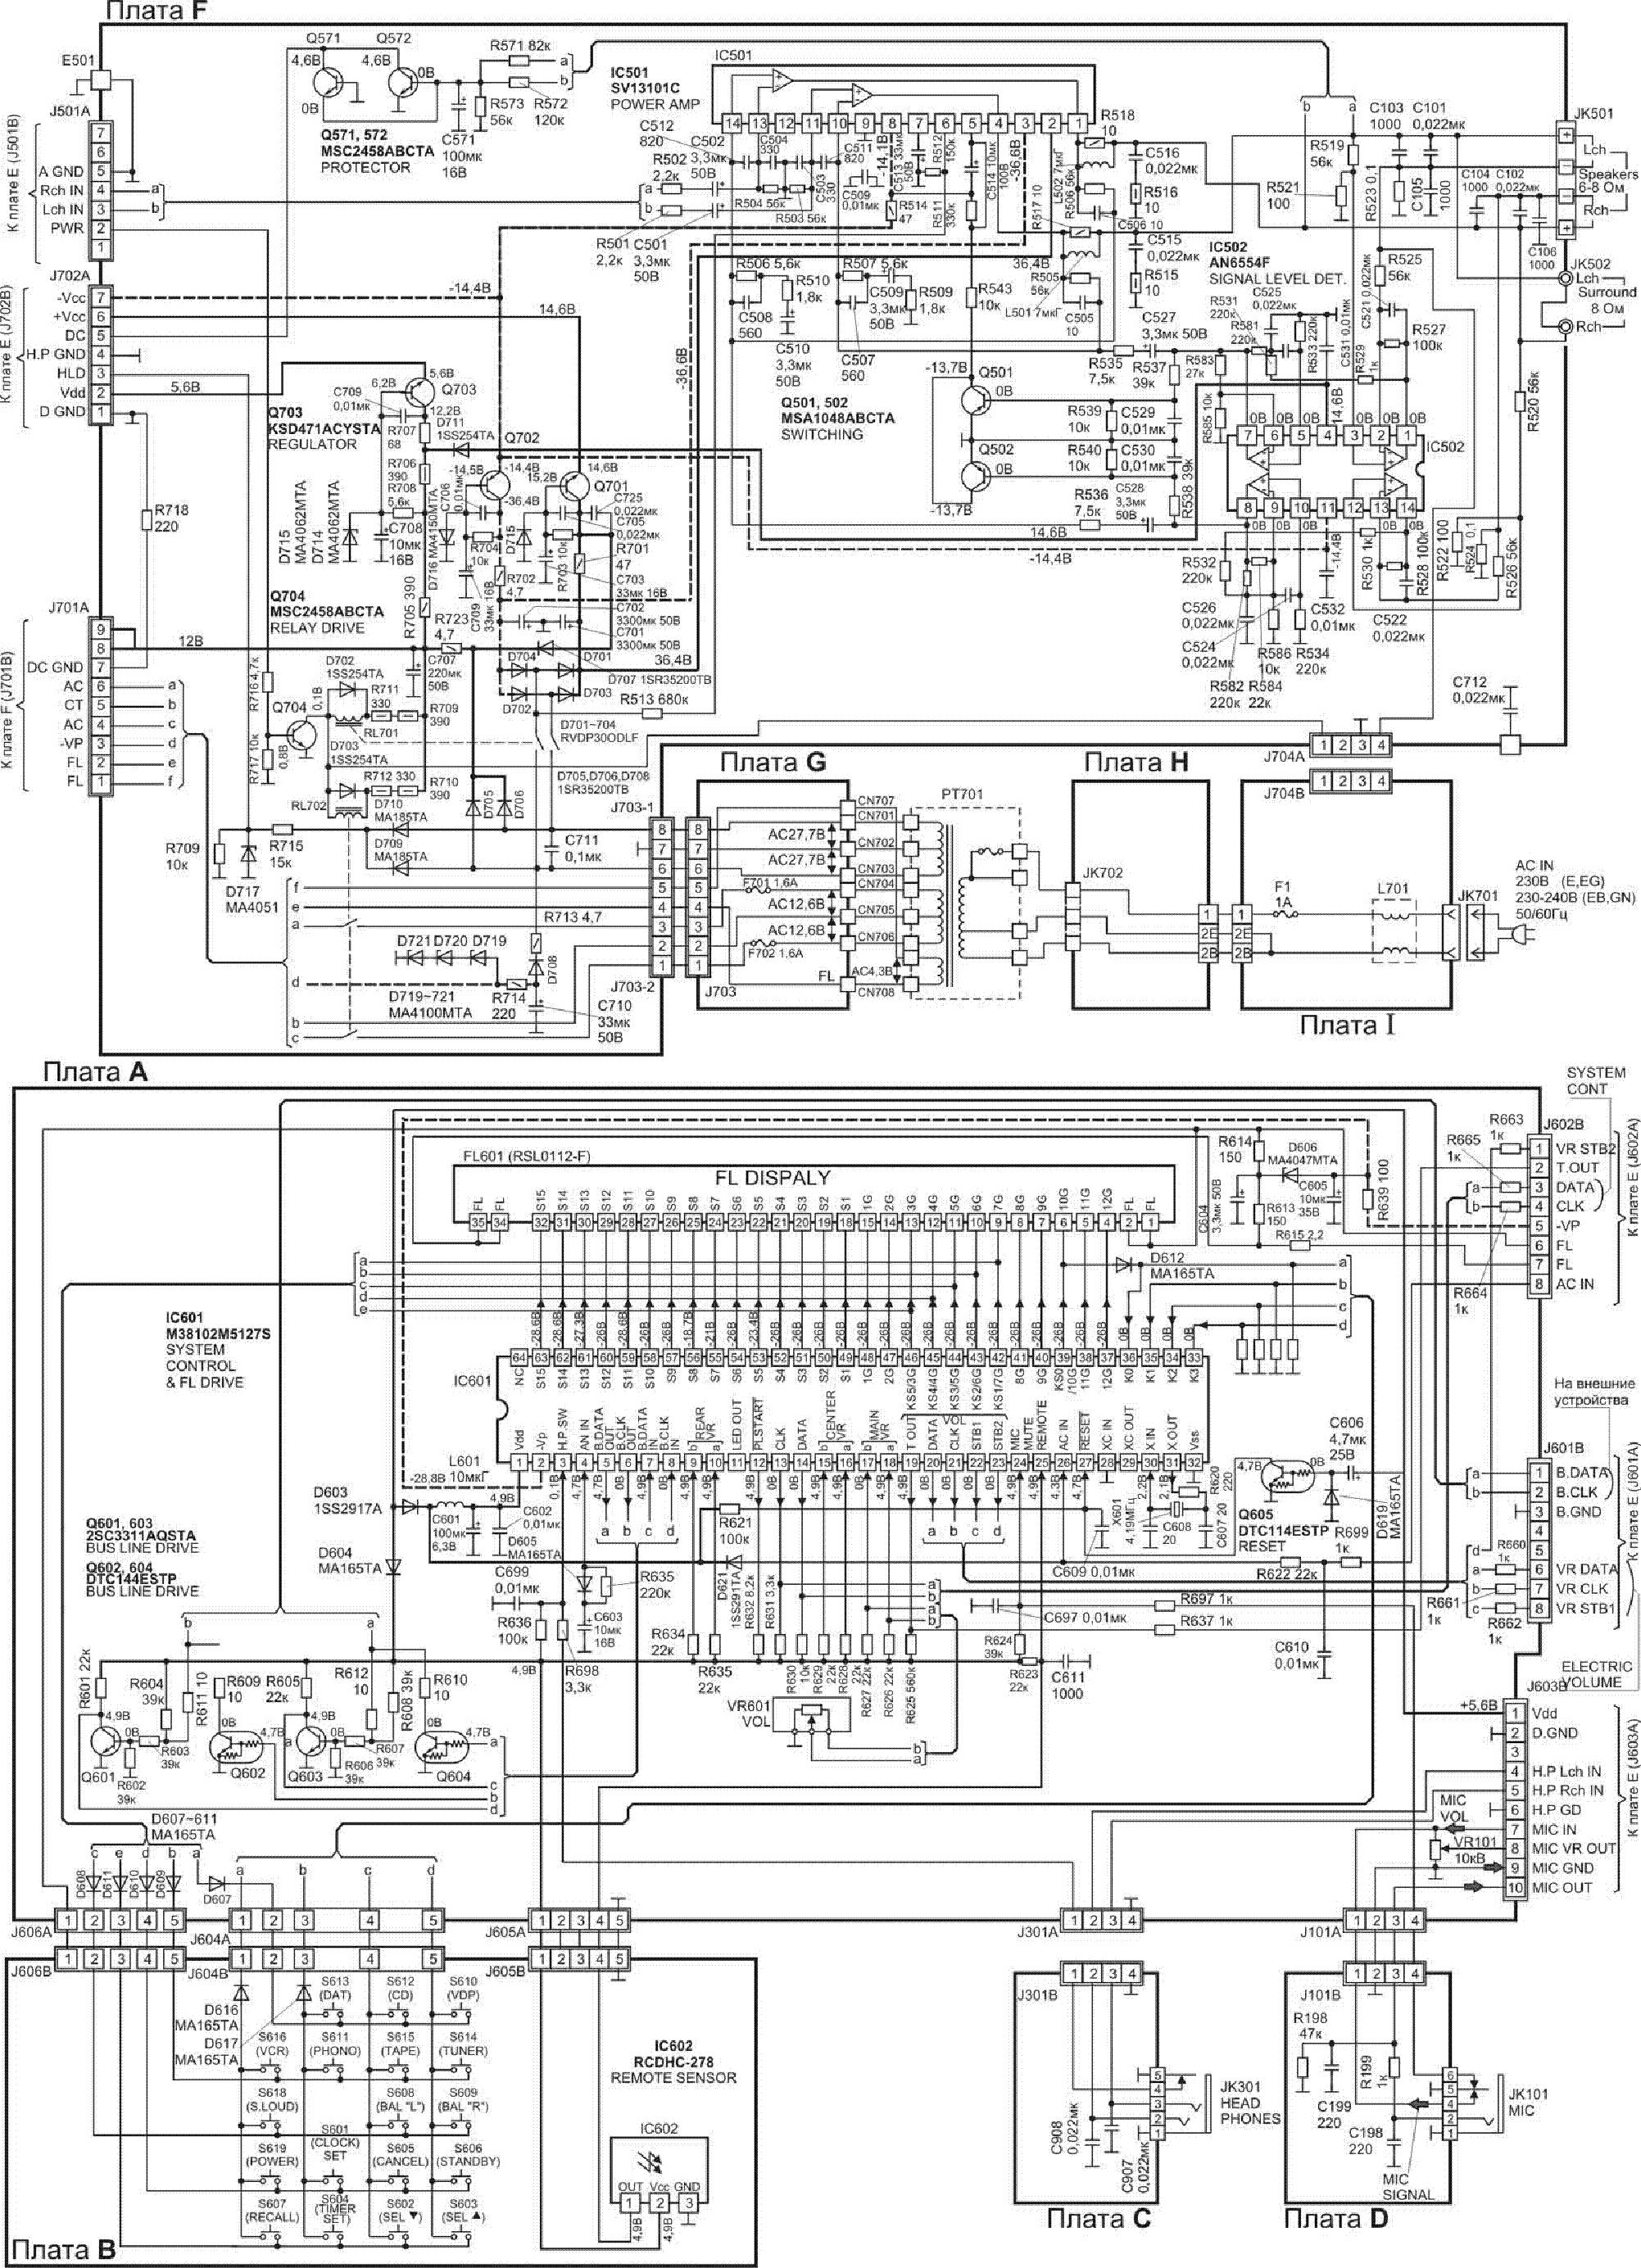 Technics St Hd301 Sch Service Manual Free Download - Imagez co